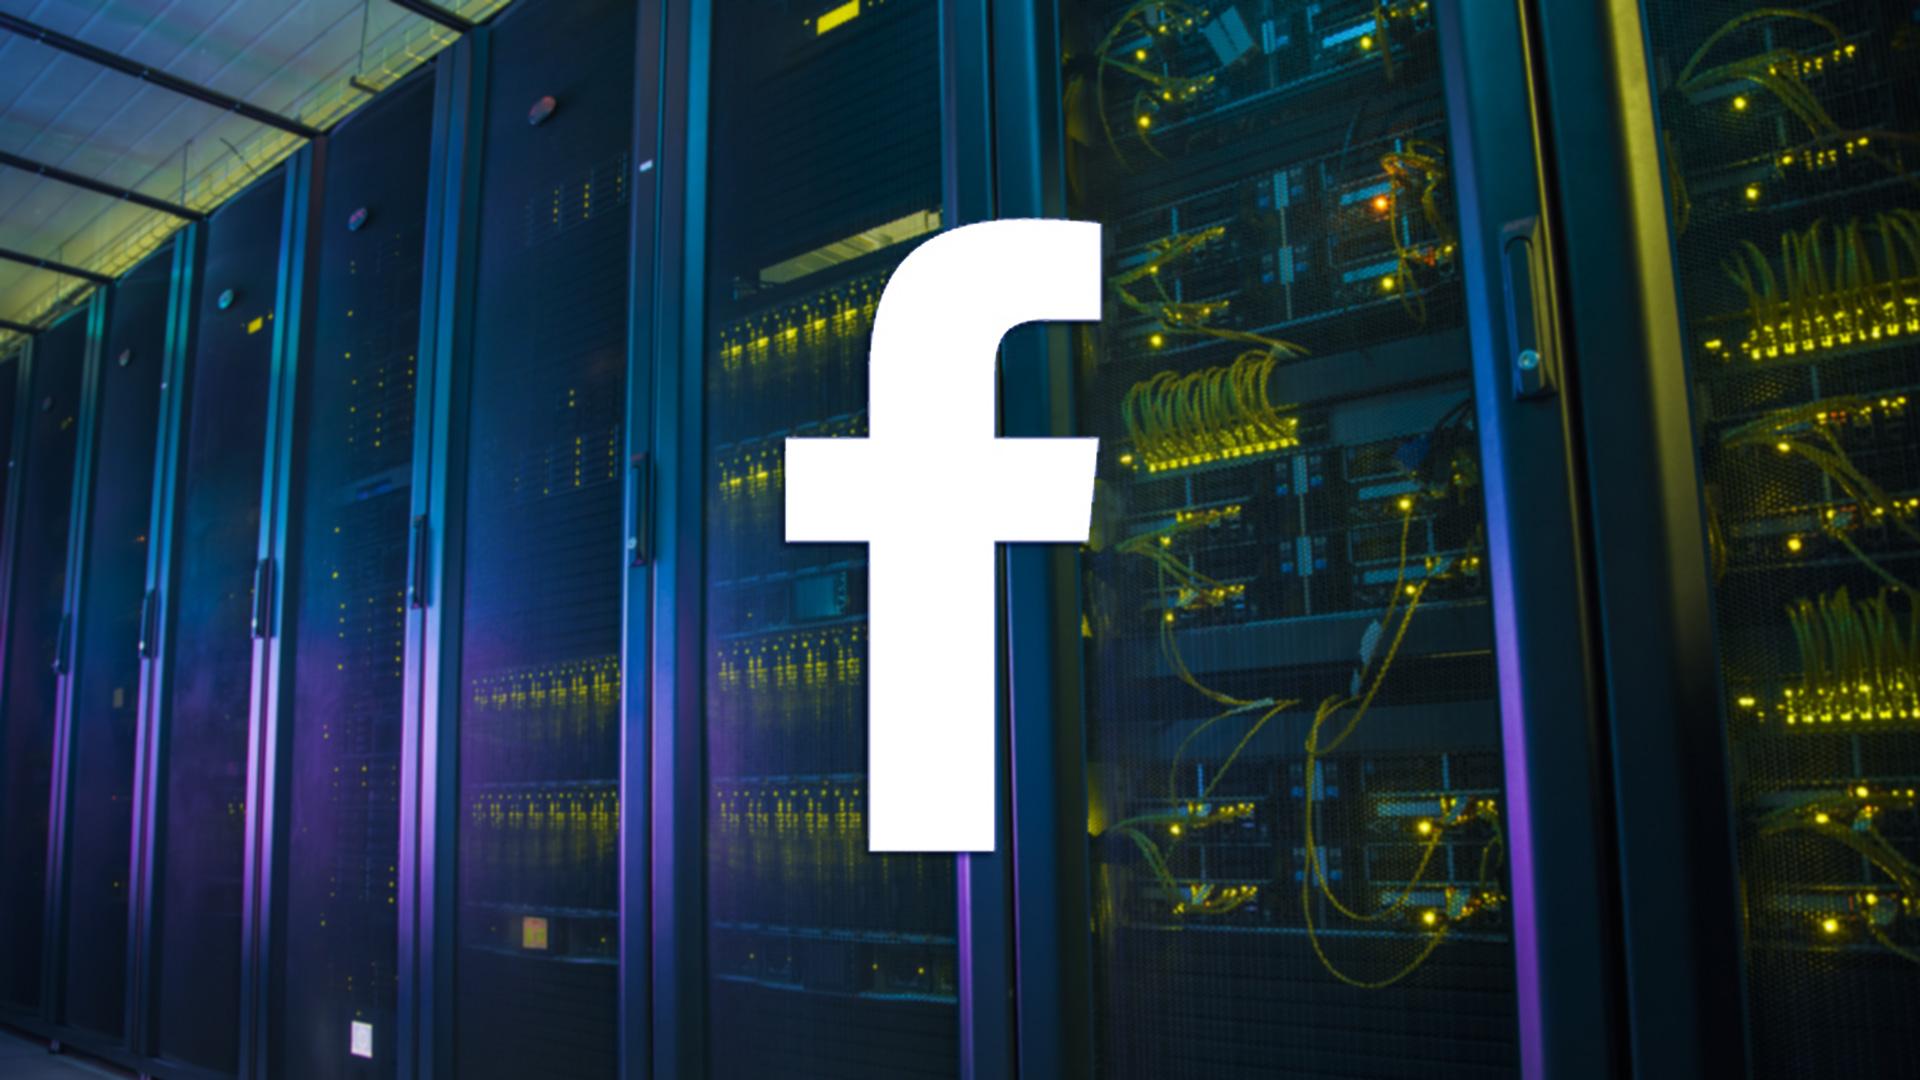 Ucom. Հայաստանում գործարկվել է Facebook սոցիալական ցանցի շտեմարանը՝ Facebook cache